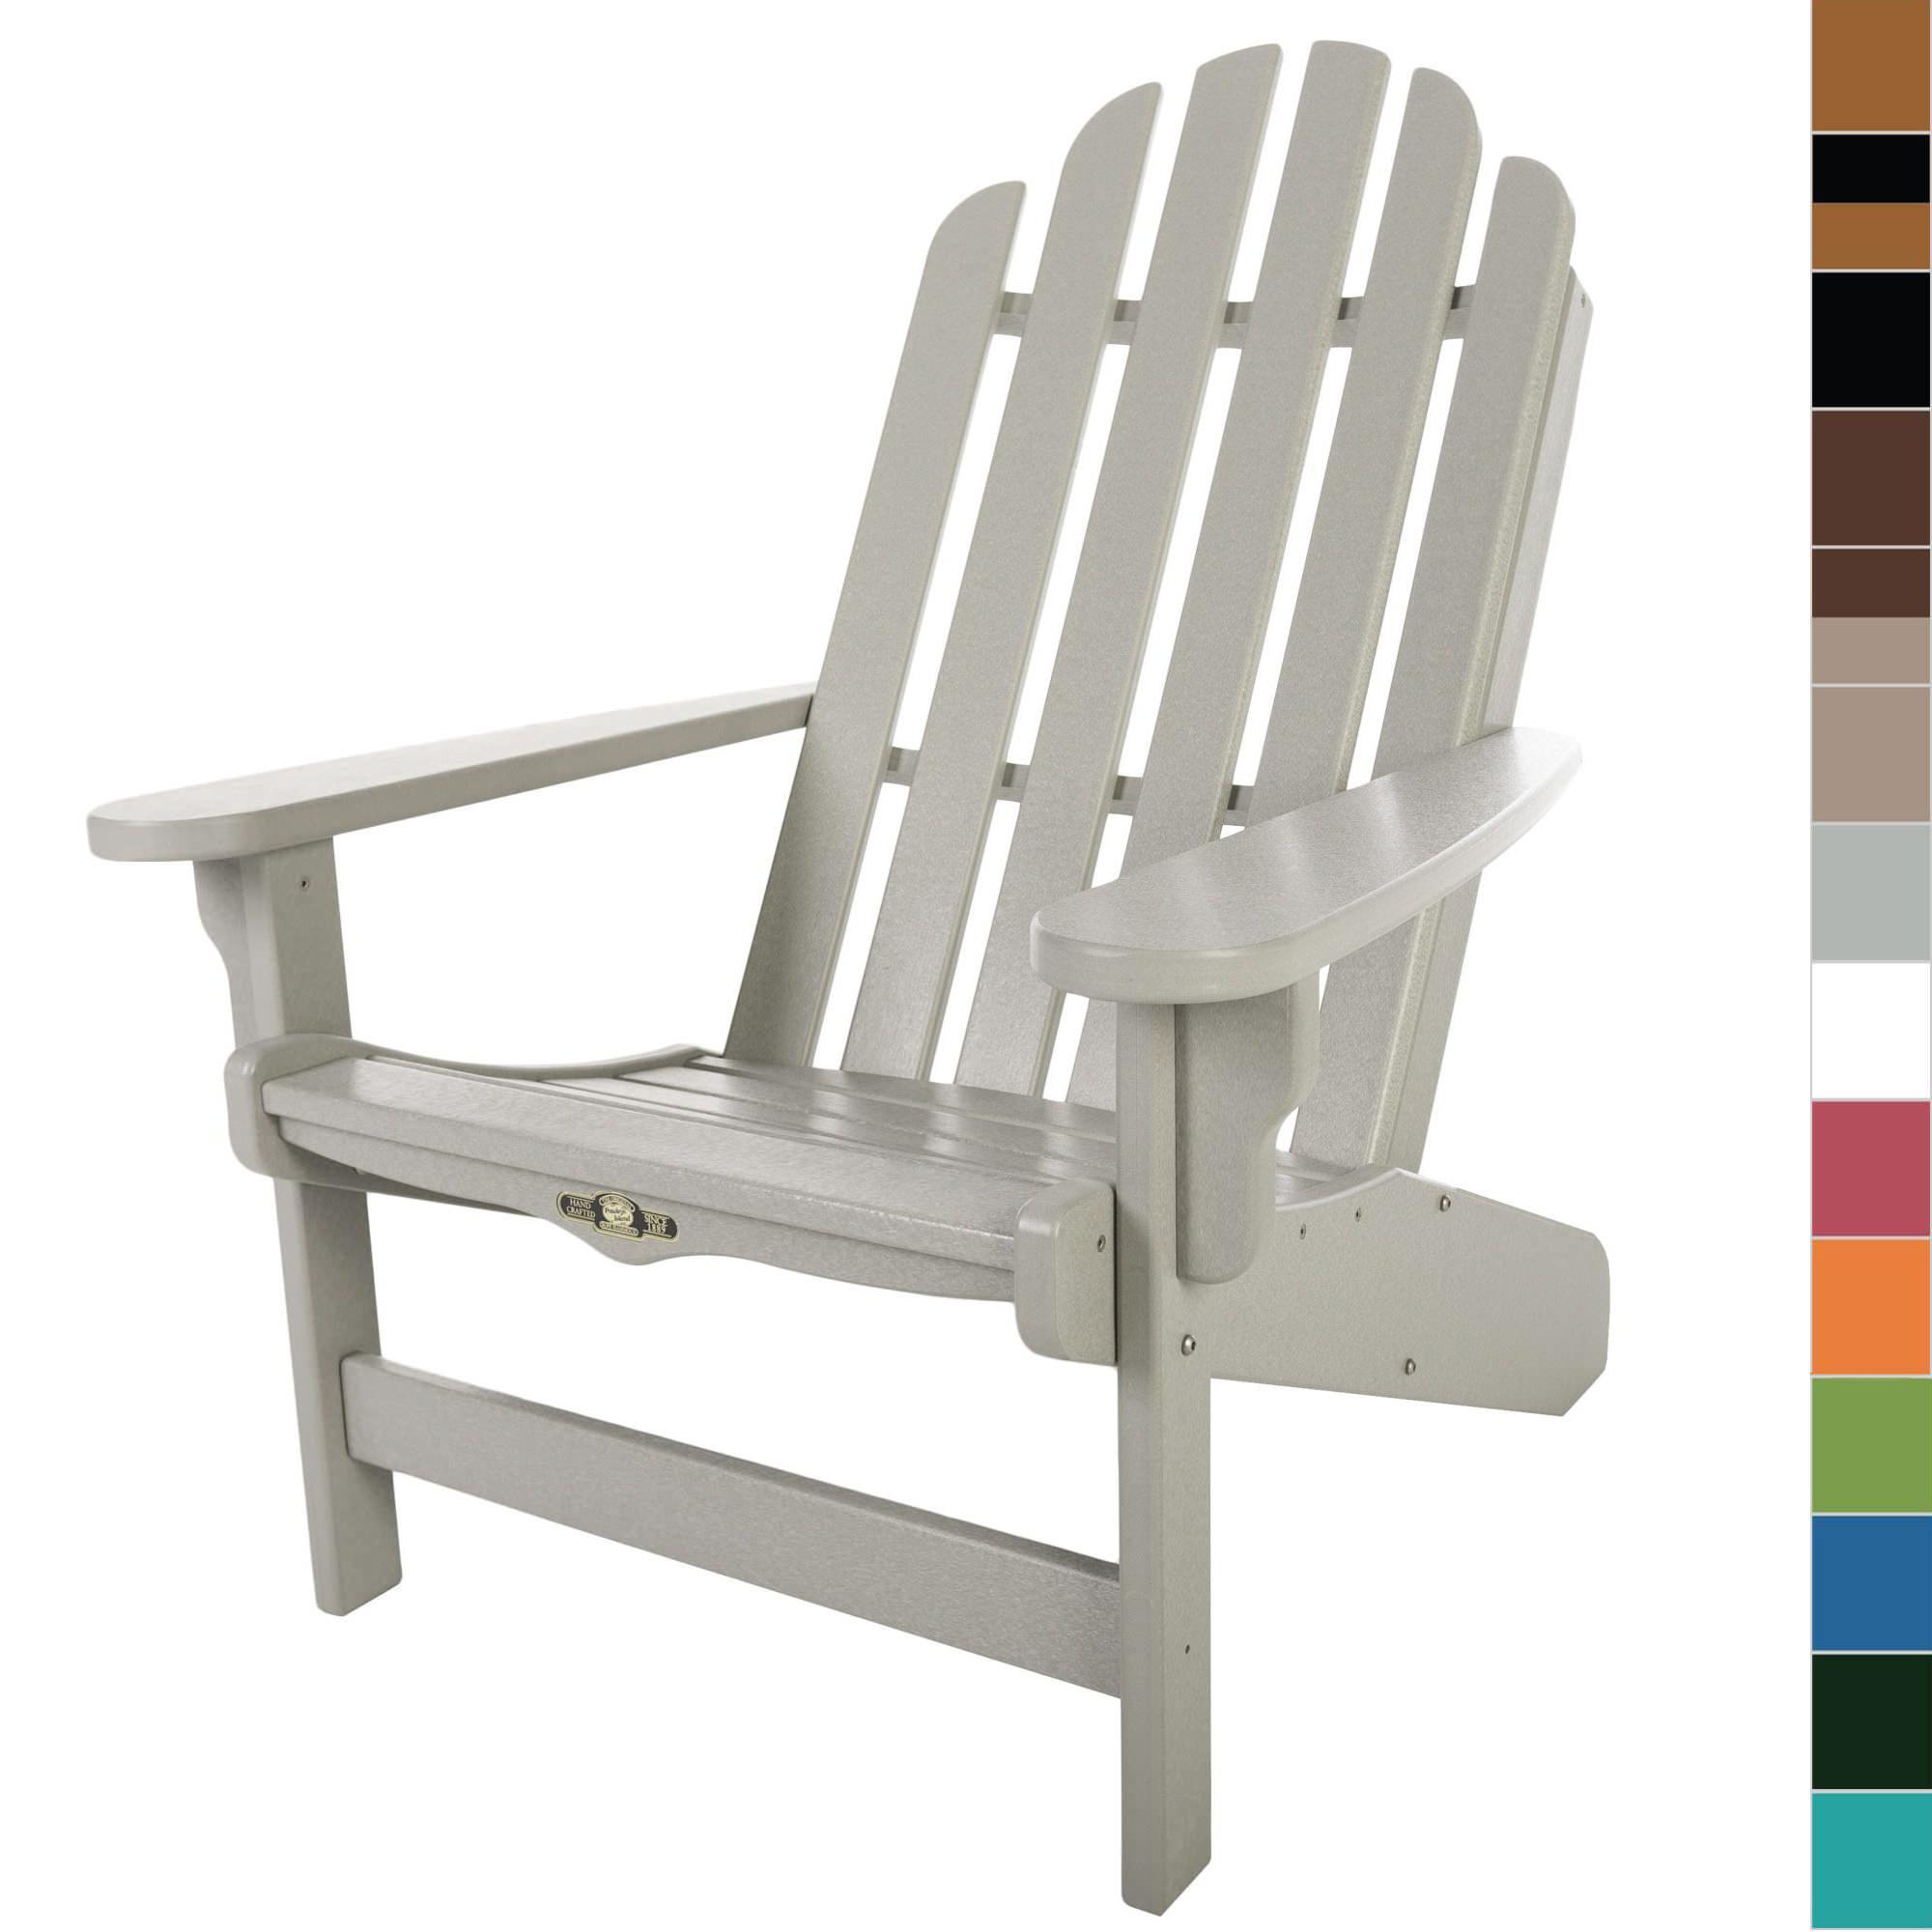 Surprising Essentials Pawleys Green Durawood Adirondack Chair Lamtechconsult Wood Chair Design Ideas Lamtechconsultcom